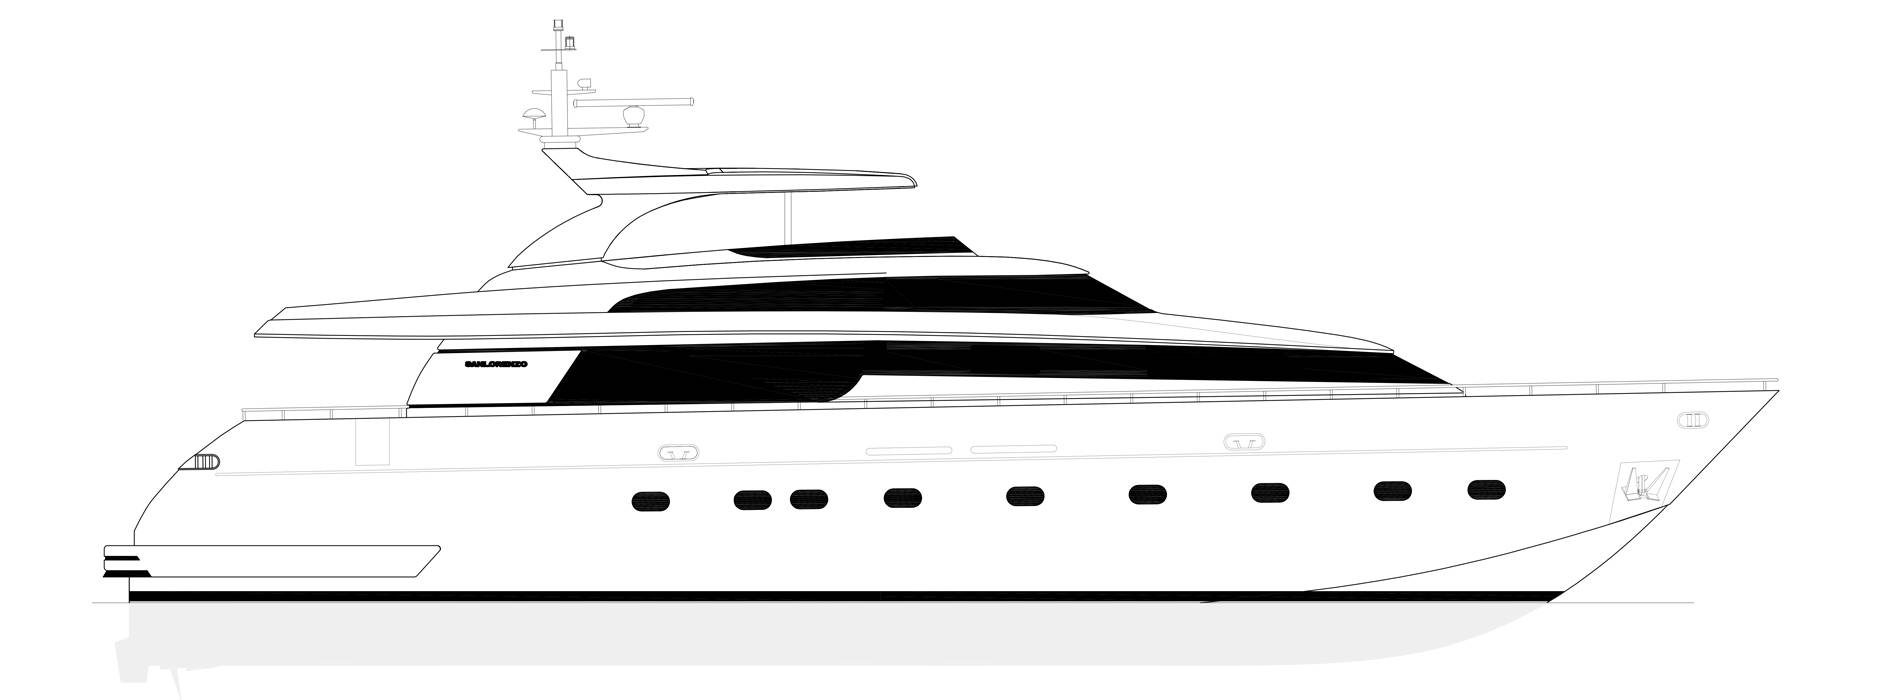 Sanlorenzo Yachts SL88-541 Profilo